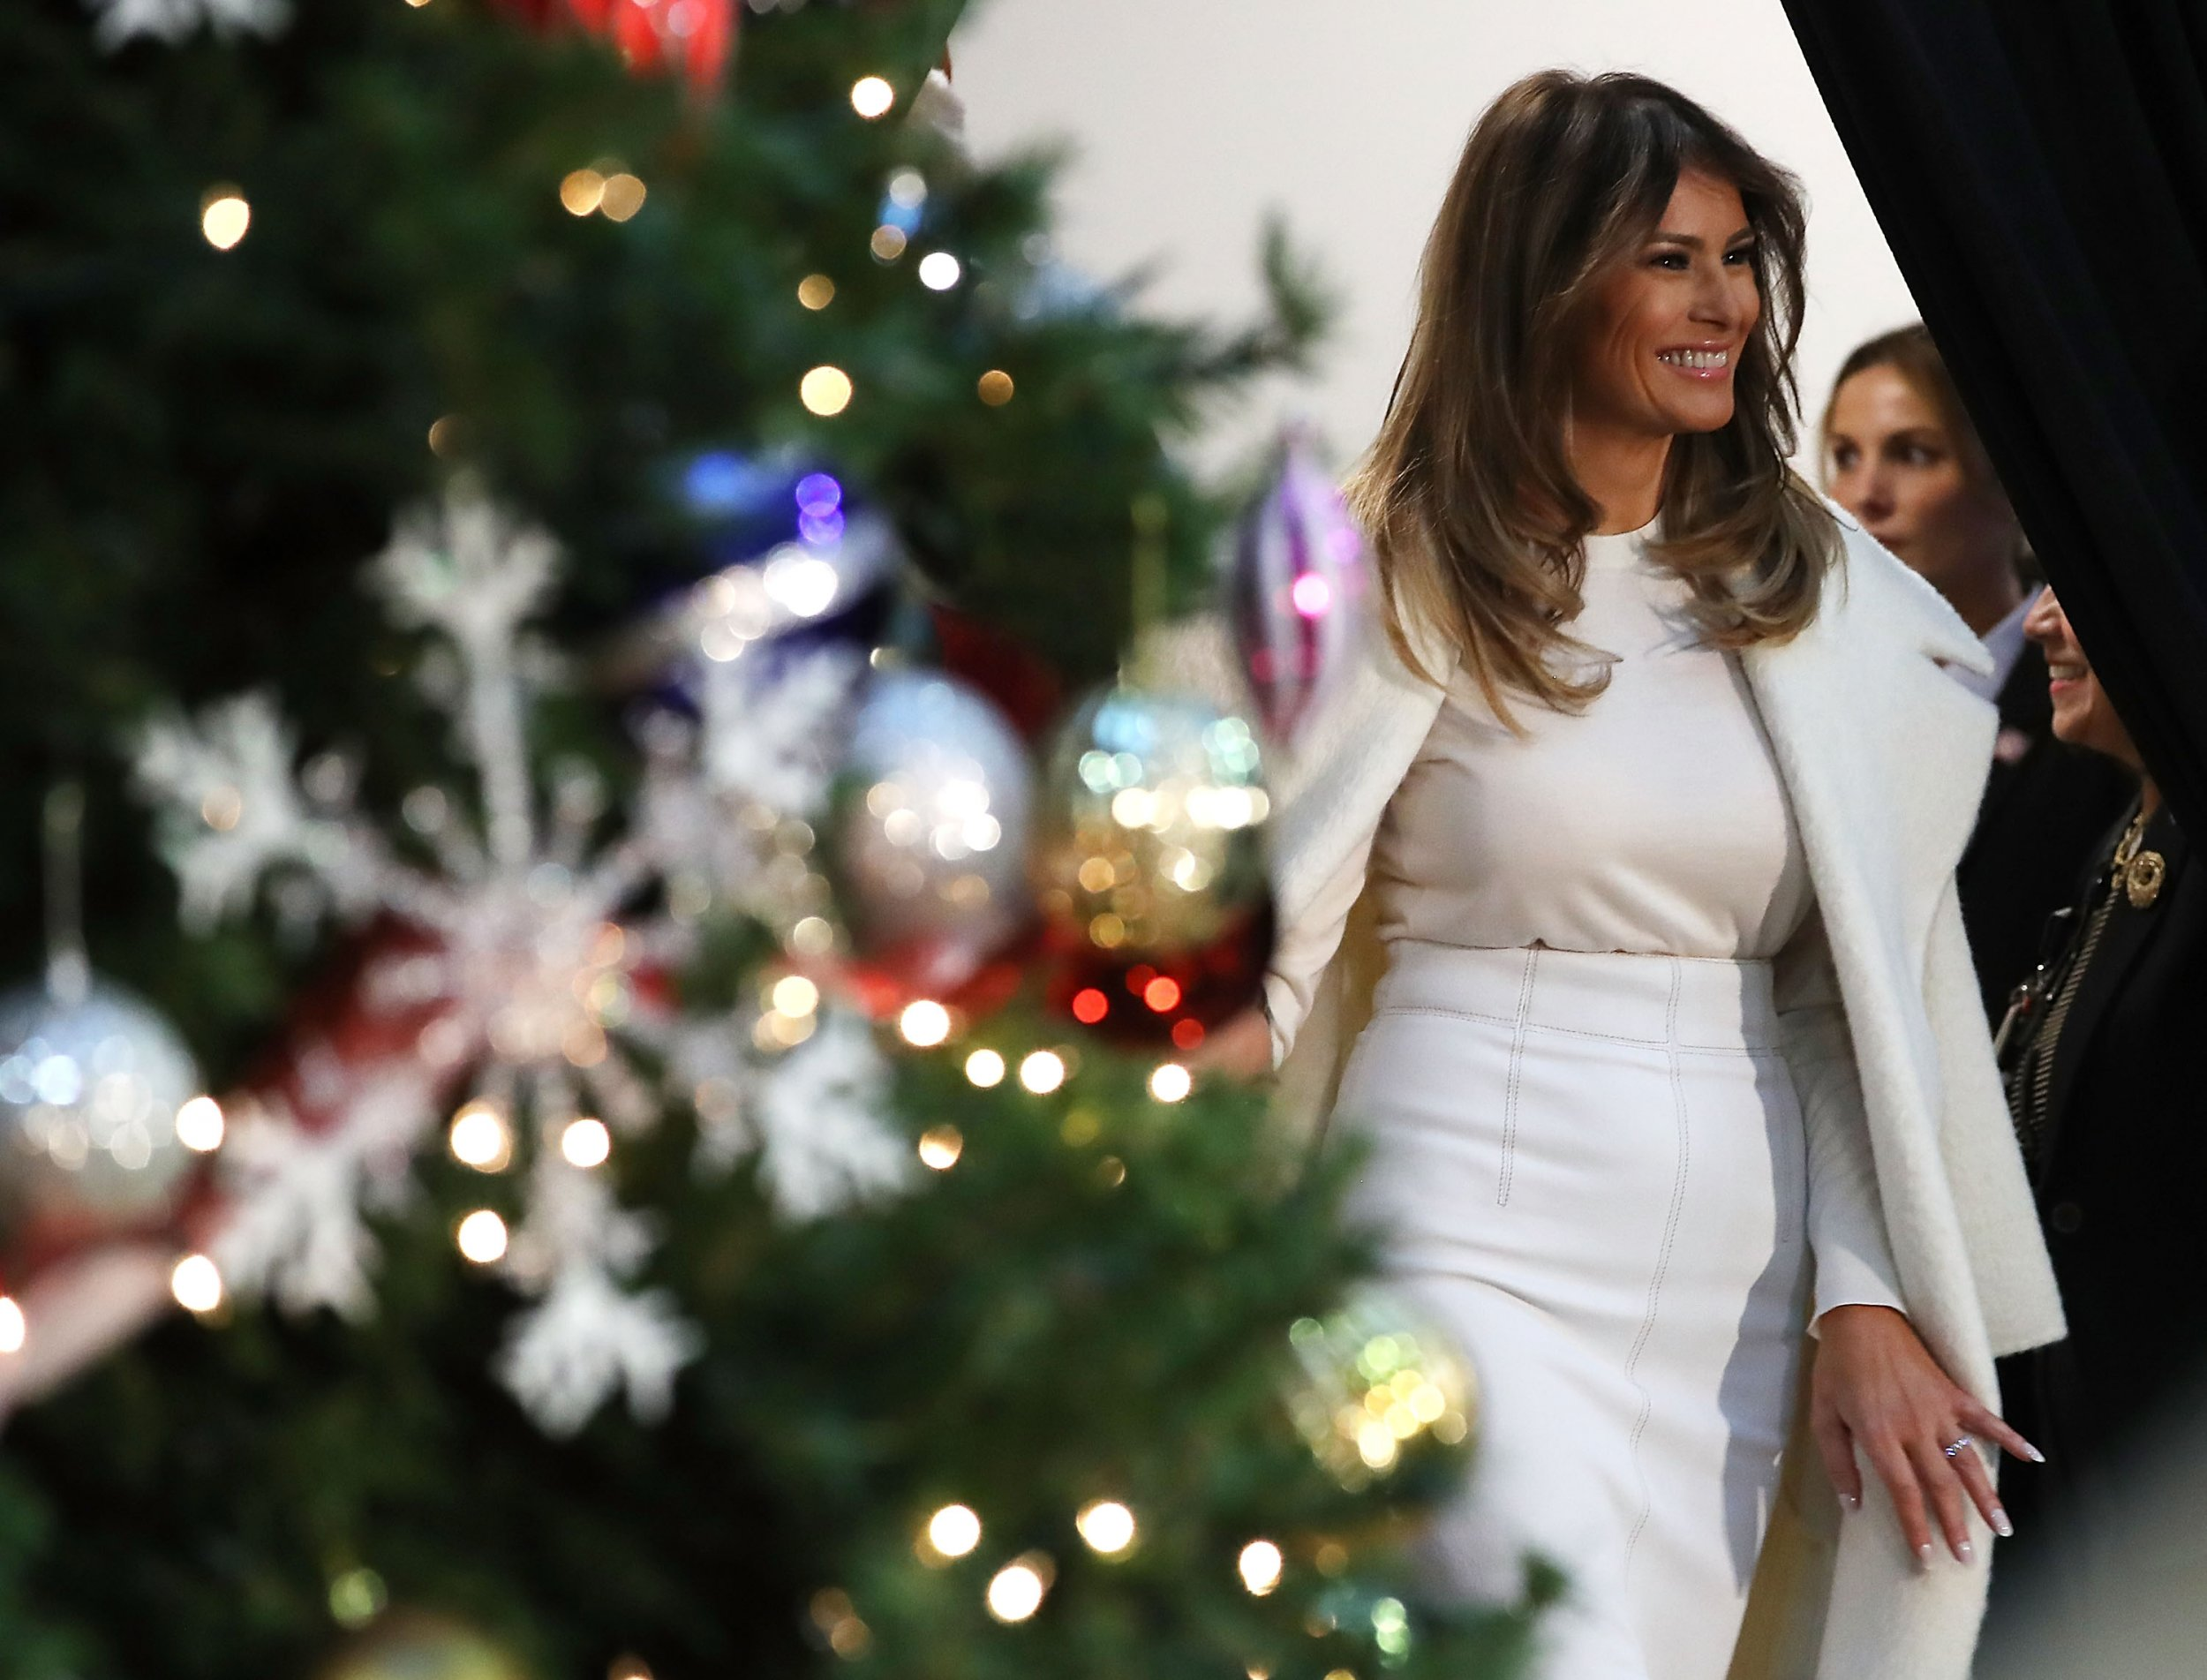 Melania Trump isn't as popular as Michelle Obama